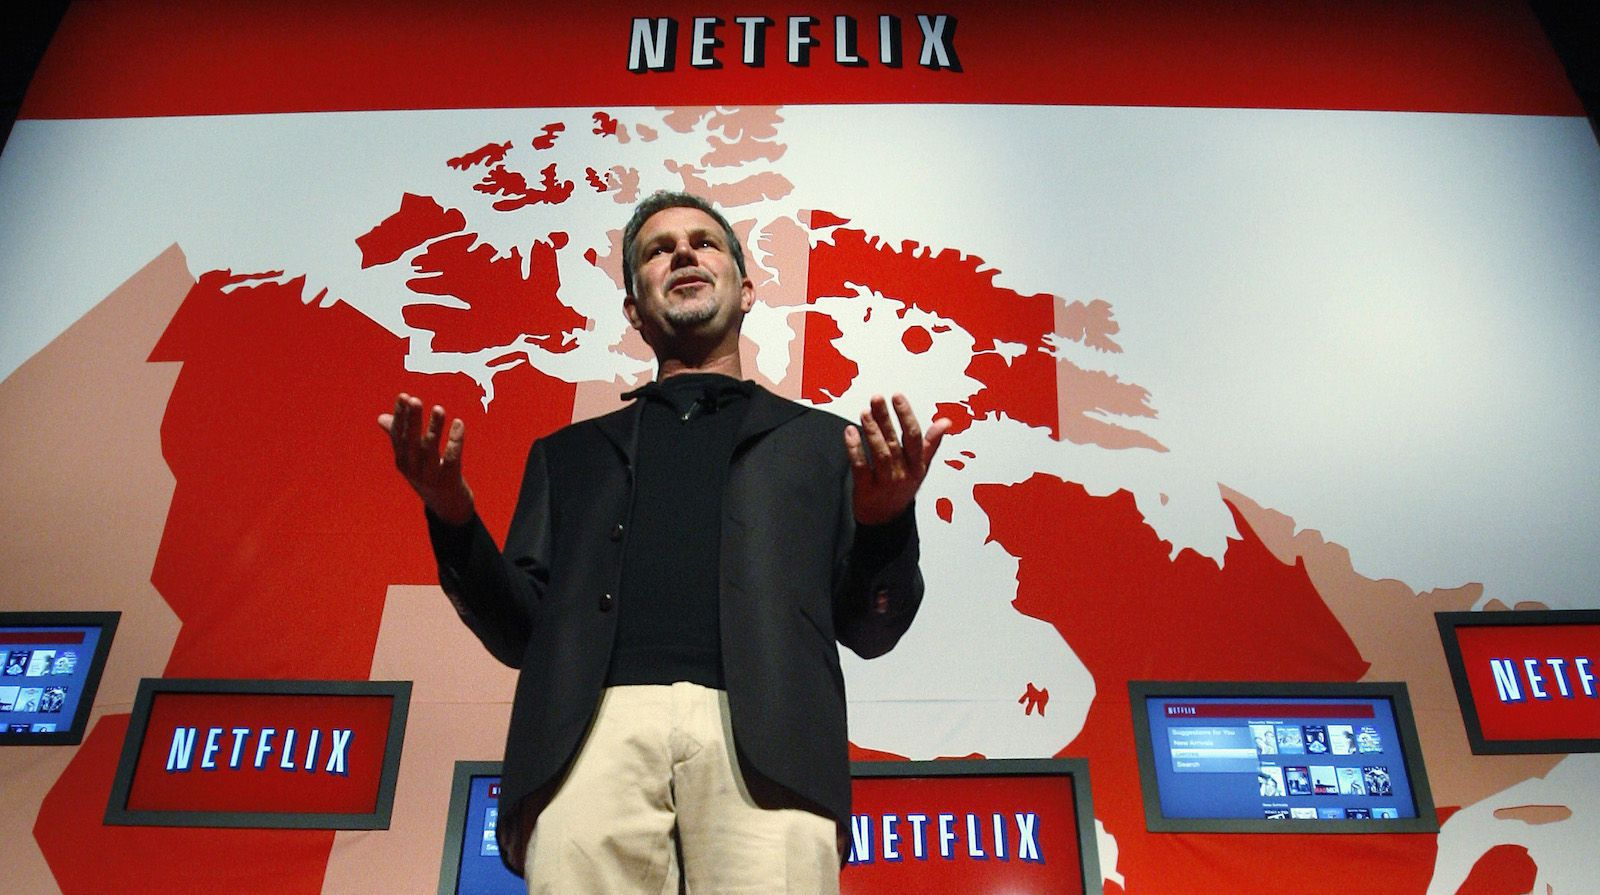 How people around the world watch Netflix